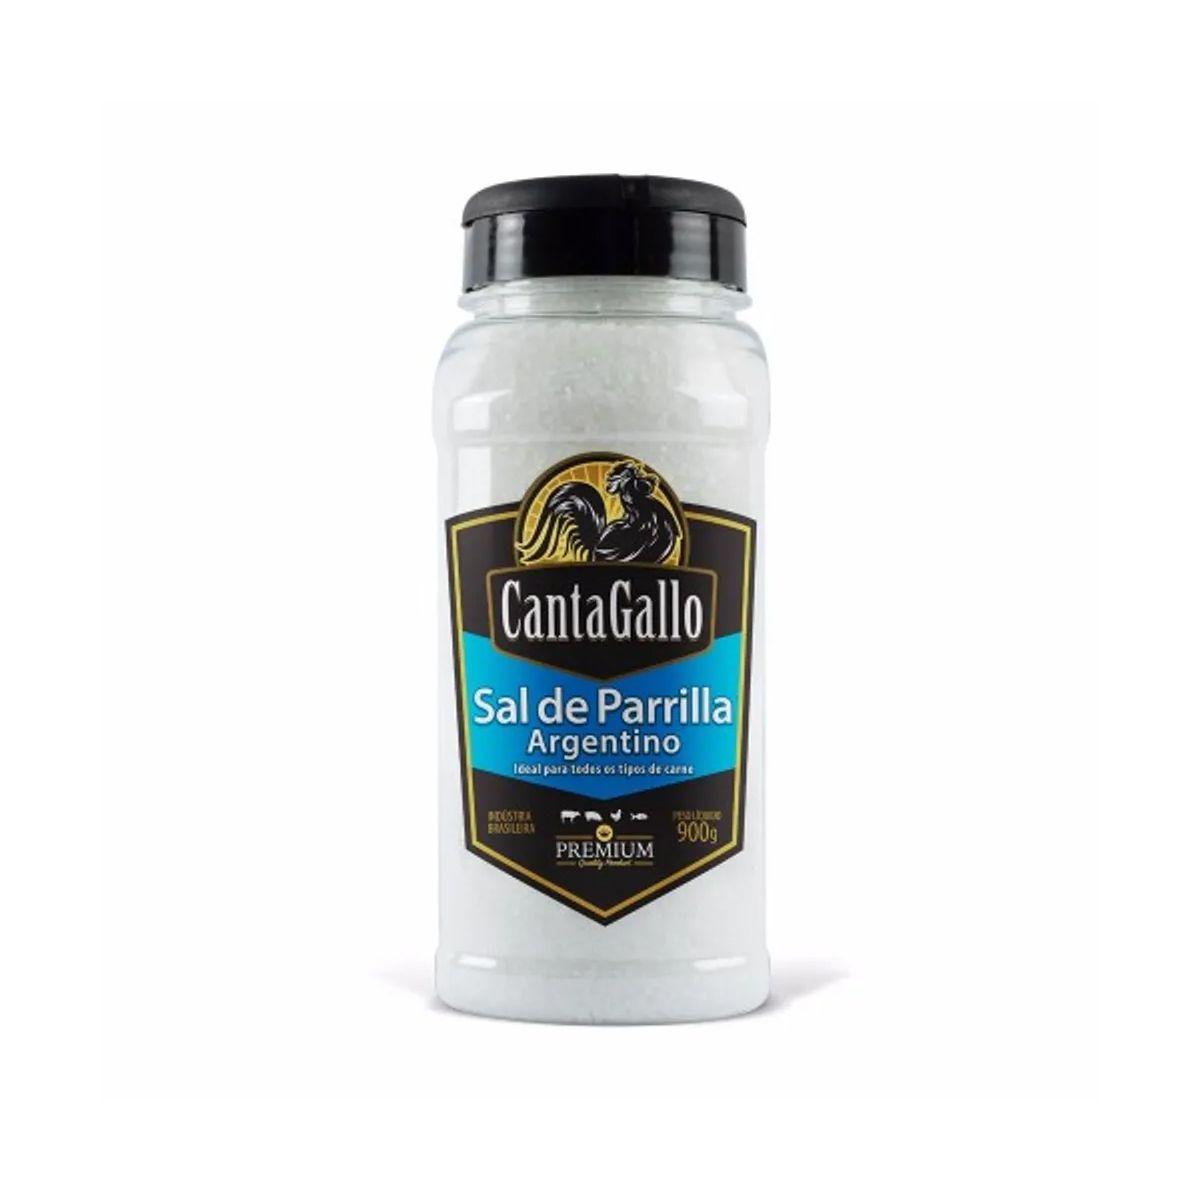 Sal de Parrilla Argentino Cantagallo Premium 900g